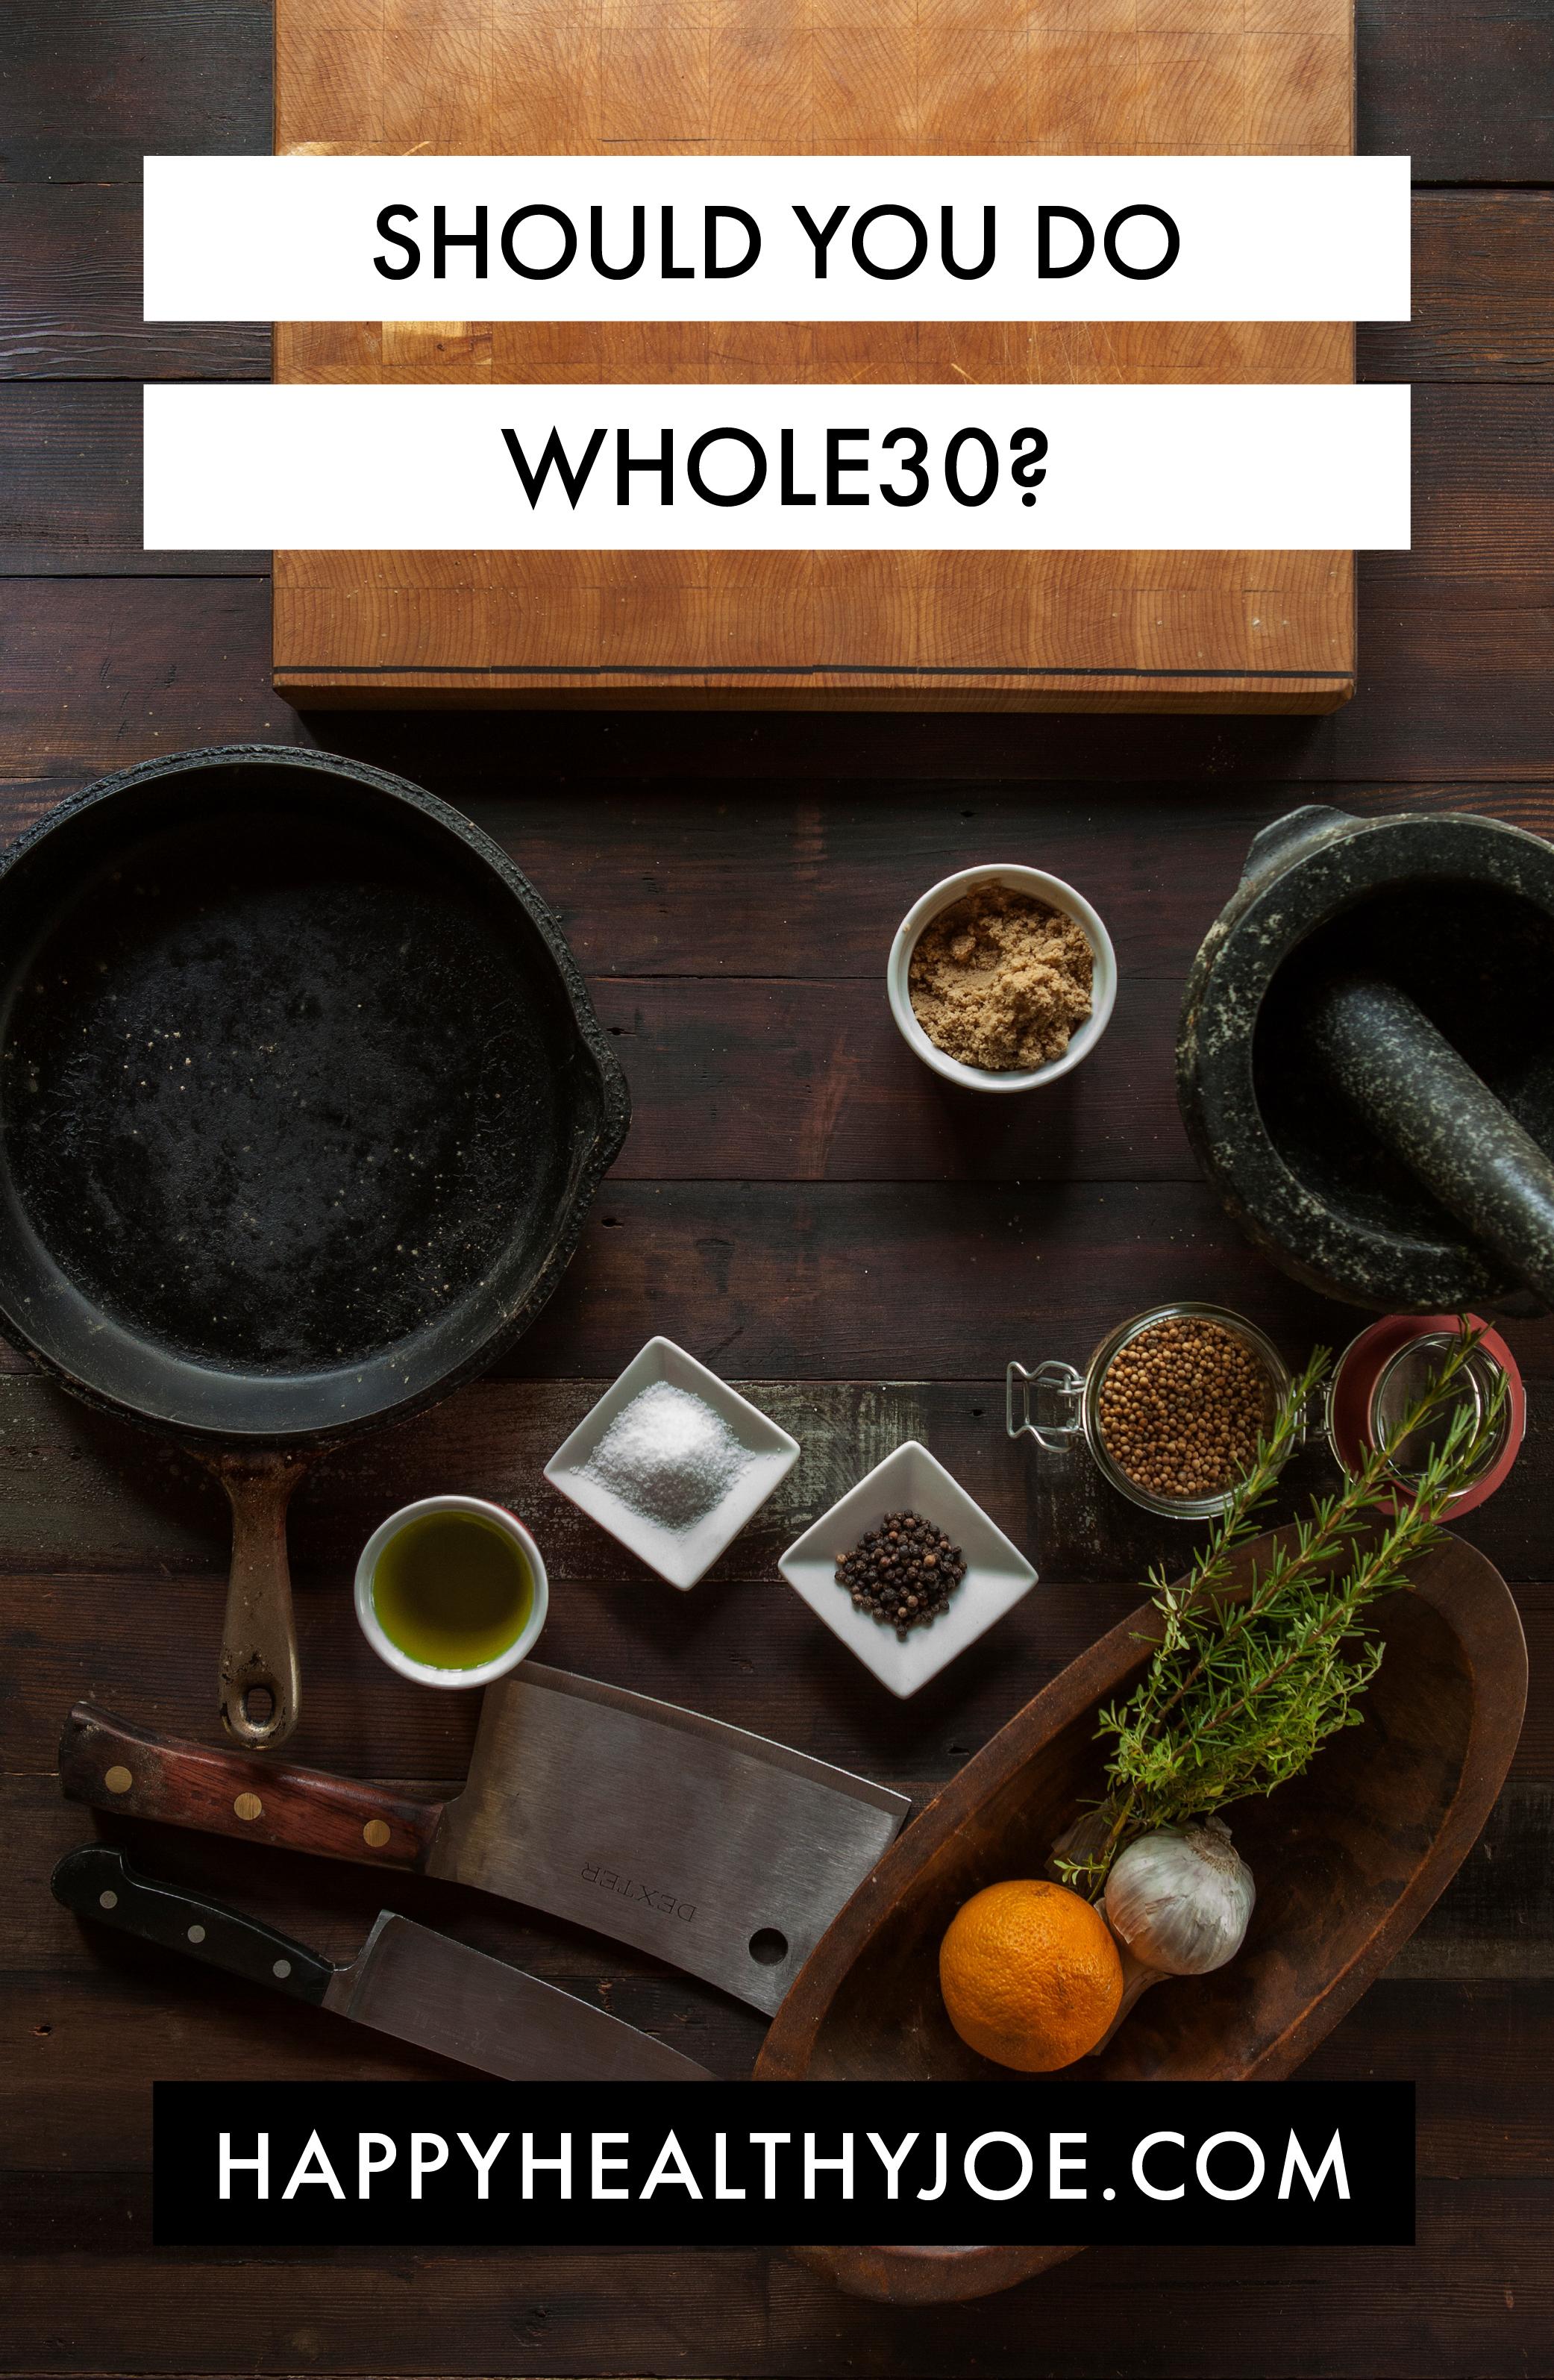 Should You Do Whole30? Happy Healthy Joe